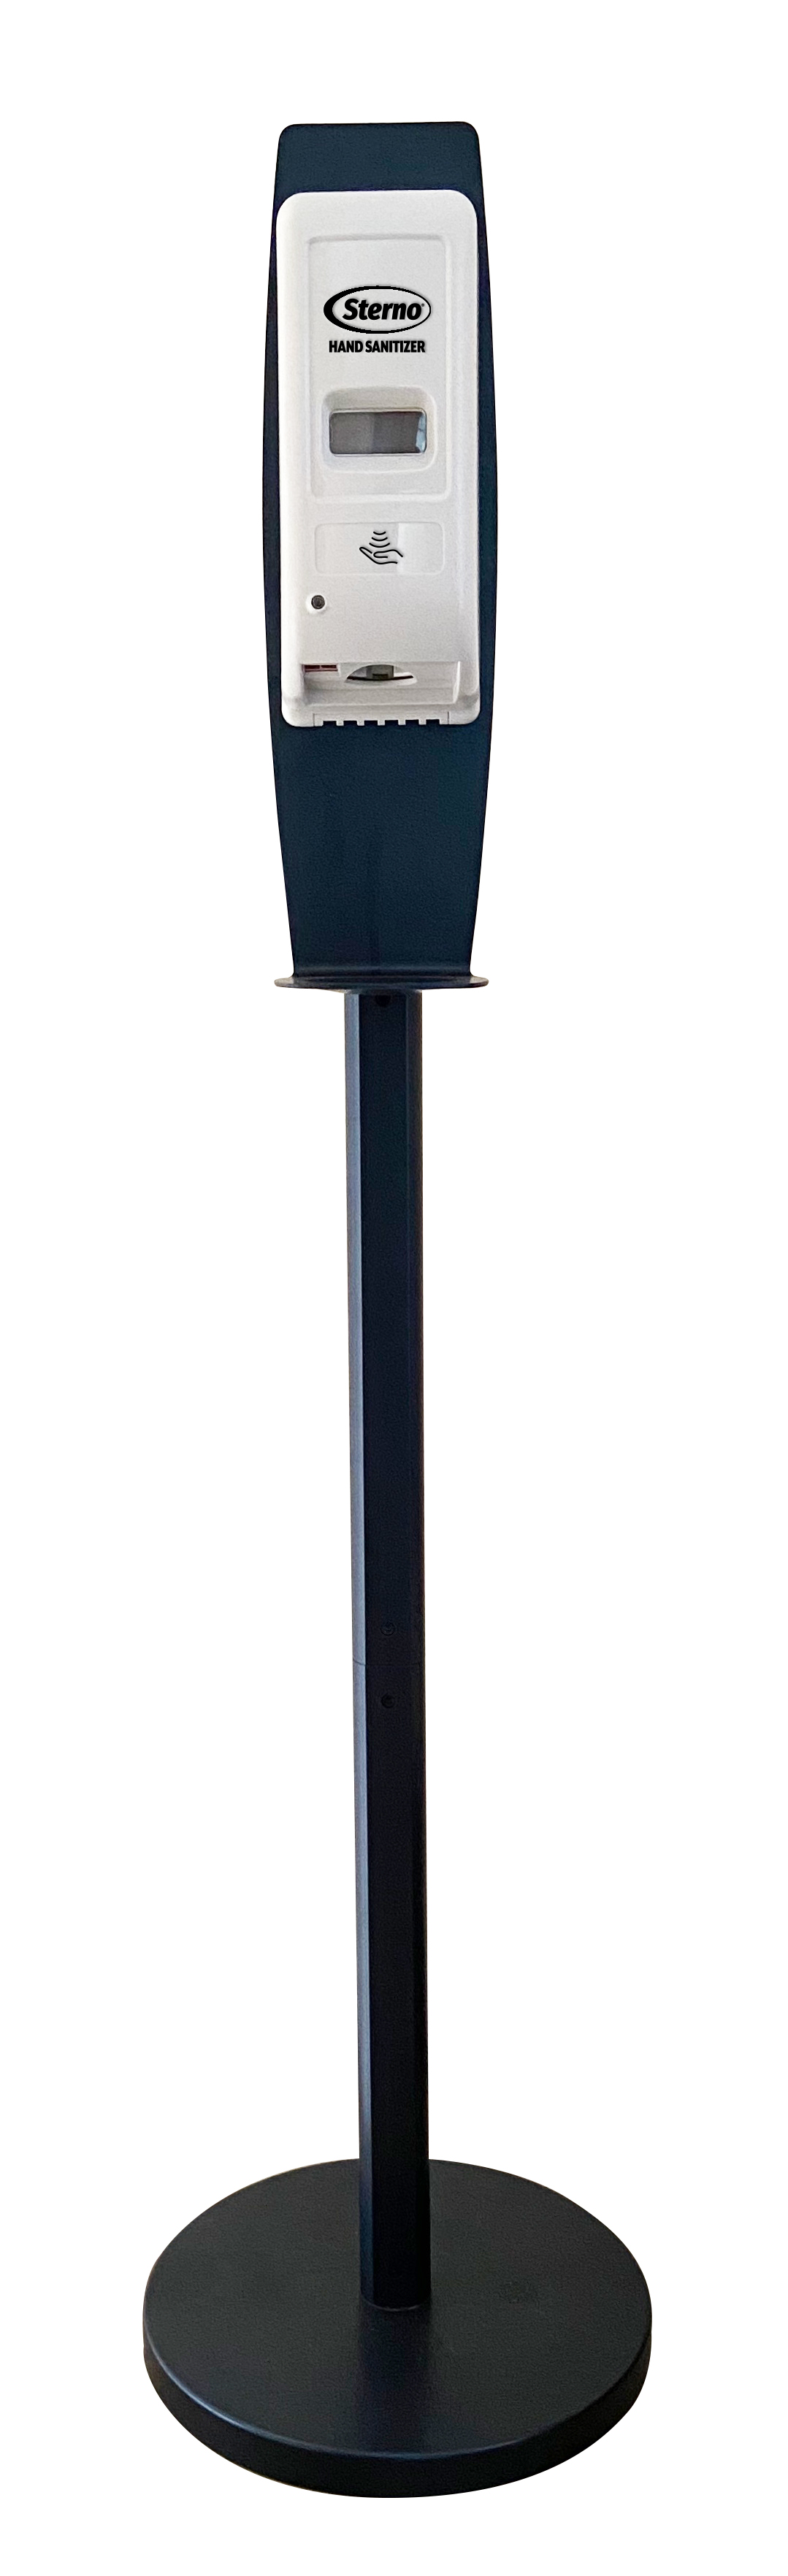 Sterno 70427 hand sanitizer dispenser